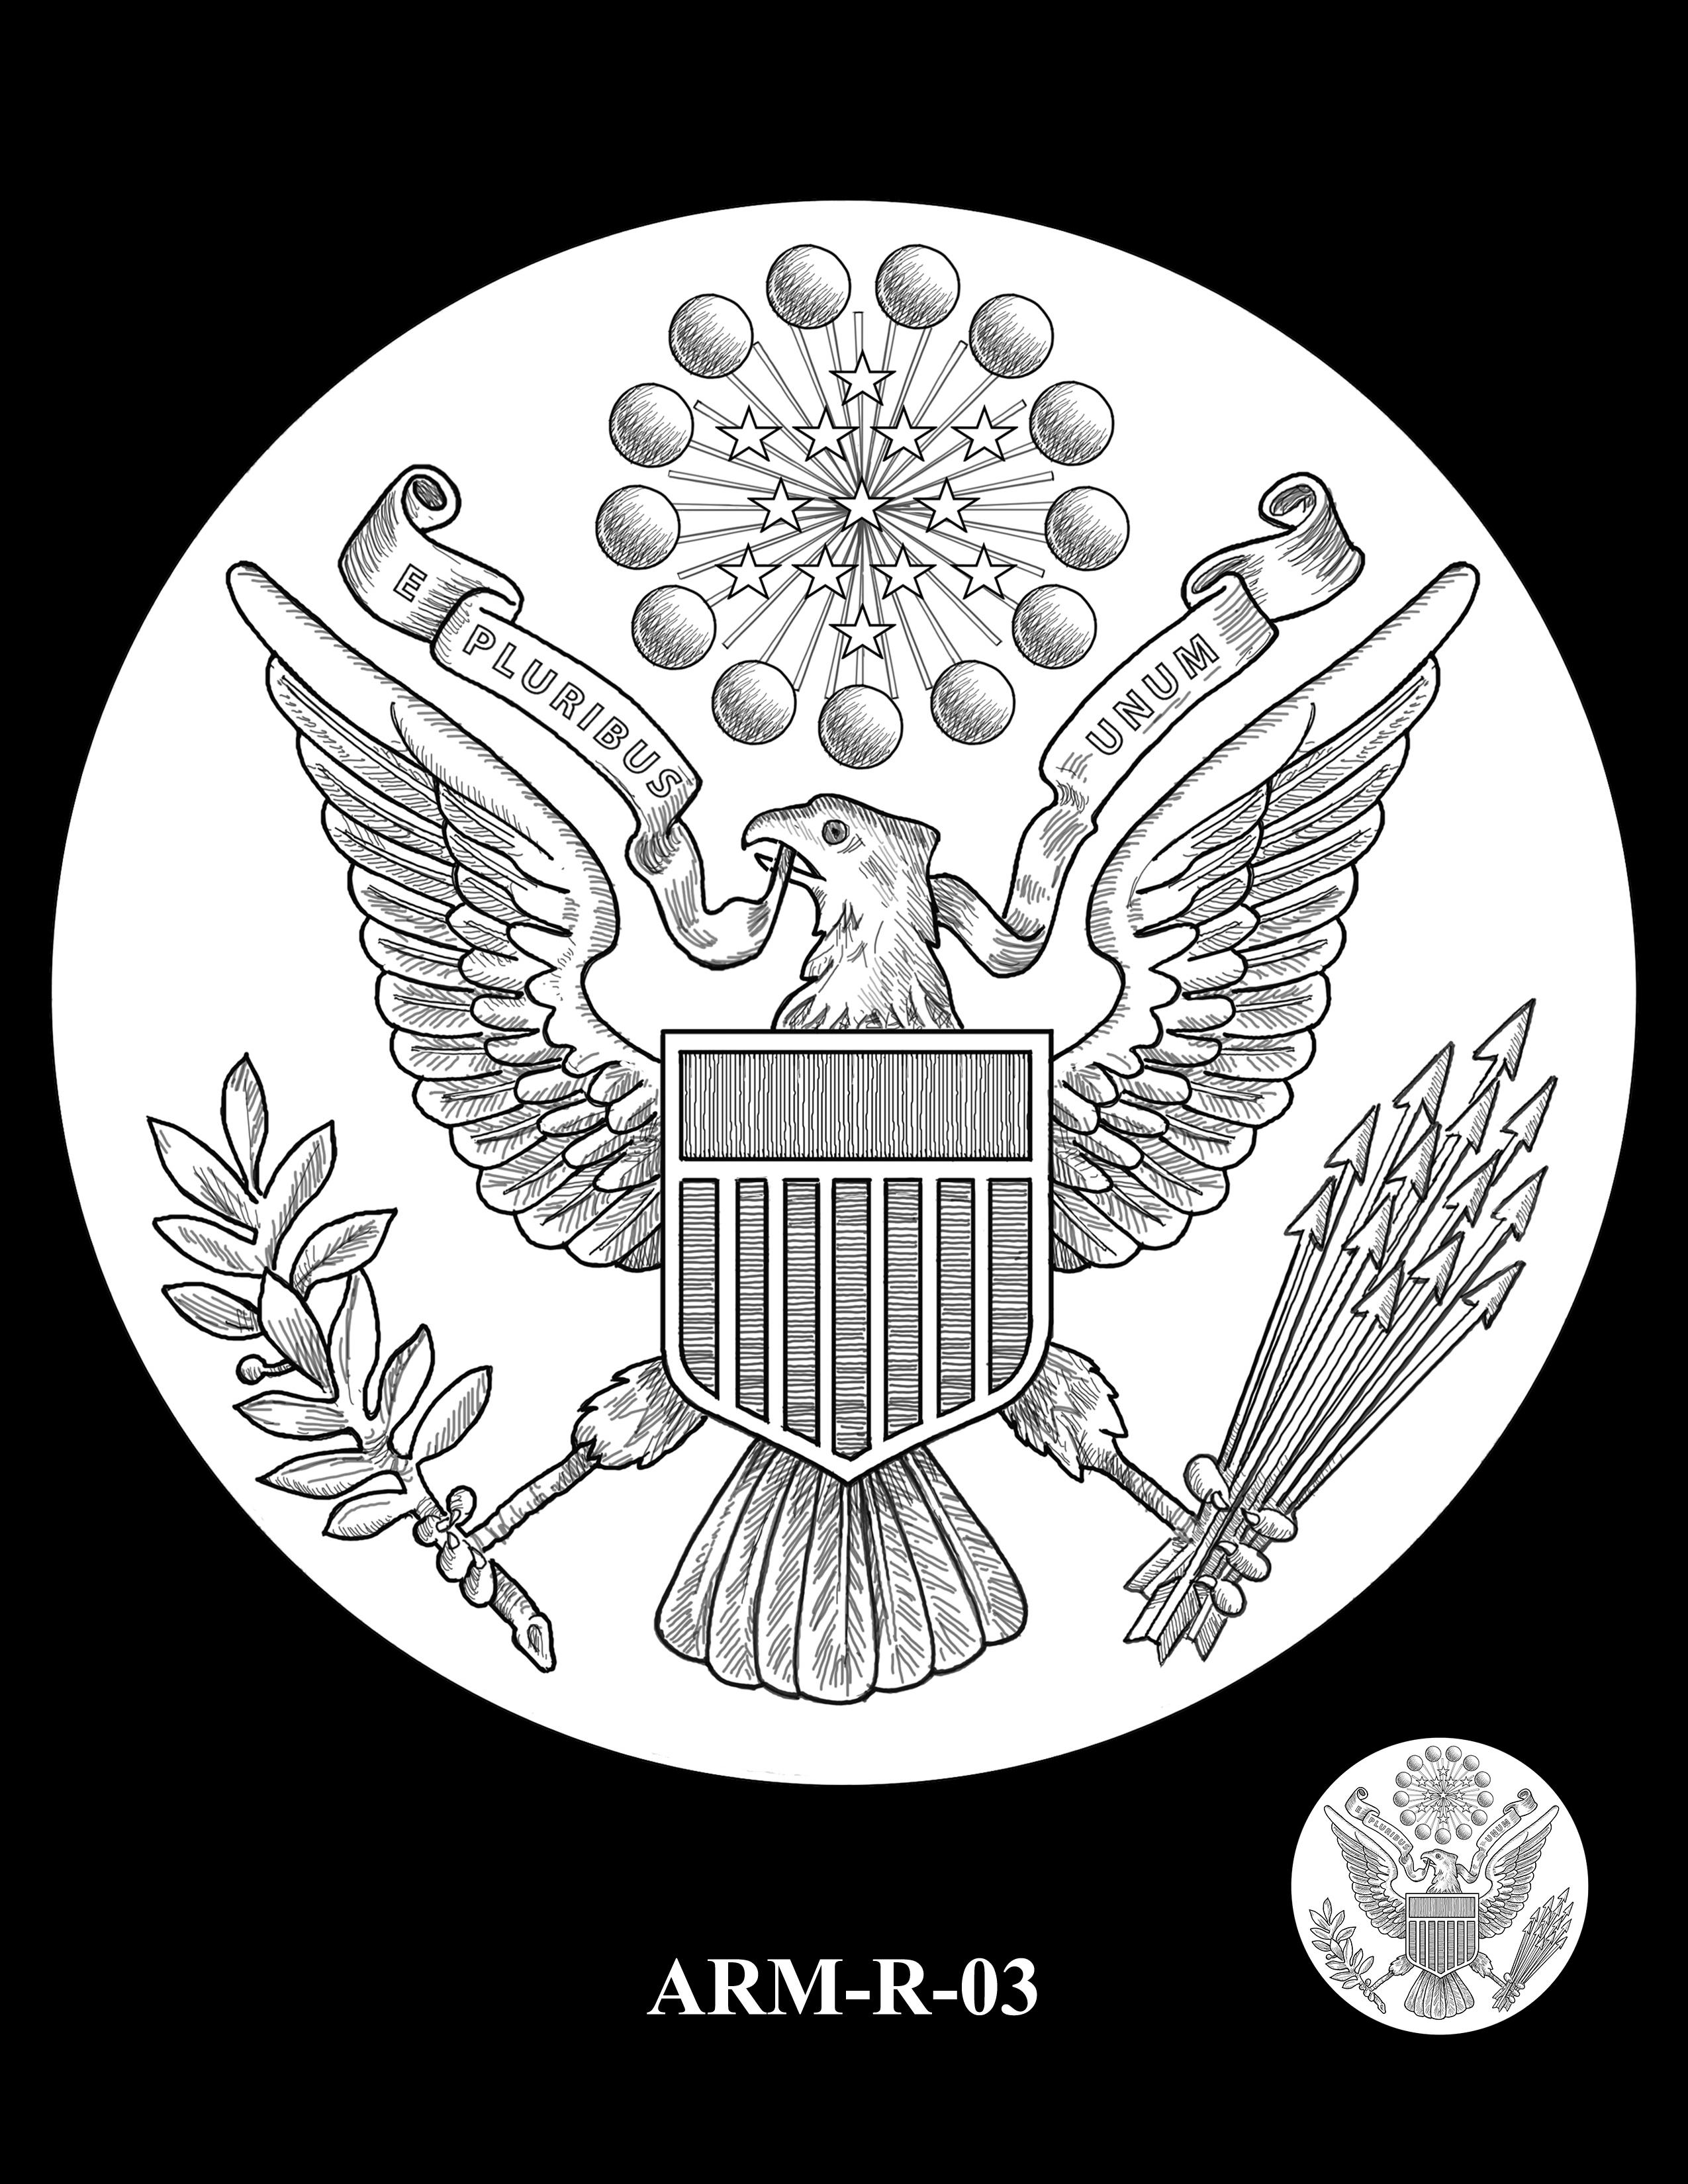 P1-ARM-R-03 -- 2018-World War I Silver Medals - Army